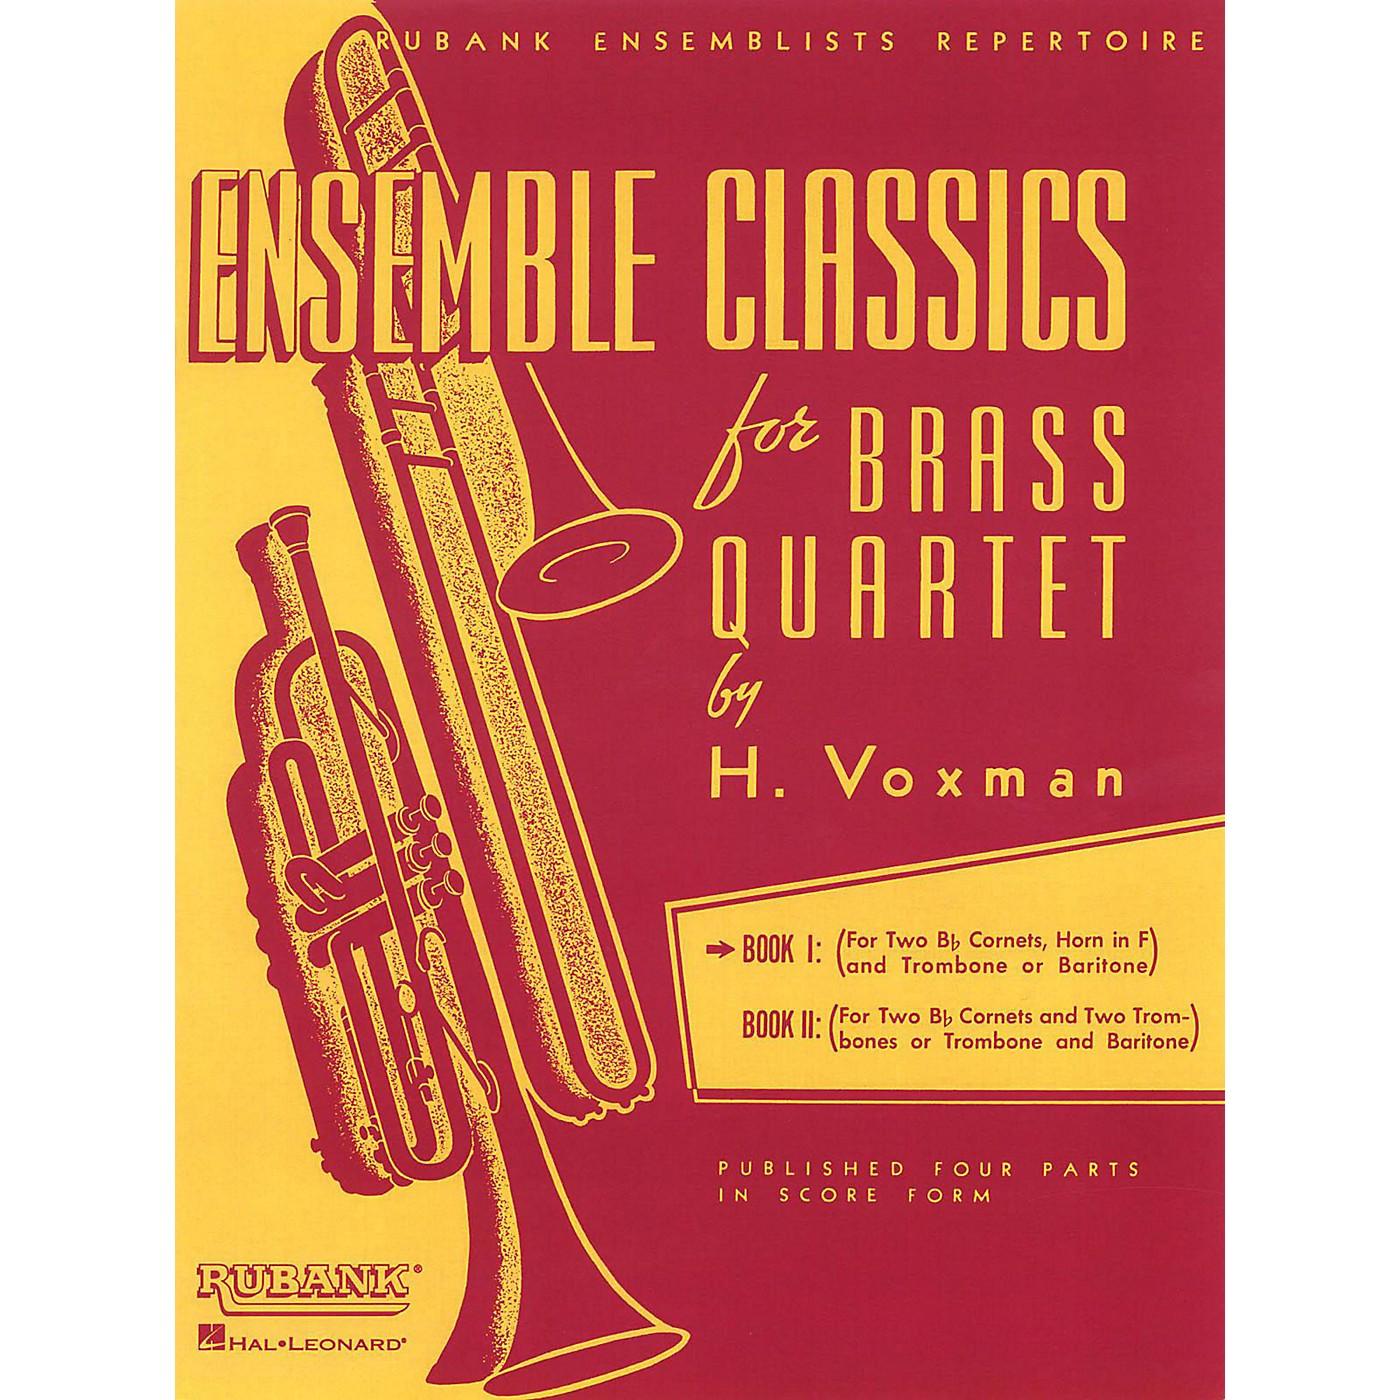 Hal Leonard Ensemble Classics for Brass Quartet Vol 1 for Two Cornets, Horn, & Trombone Or Baritone thumbnail